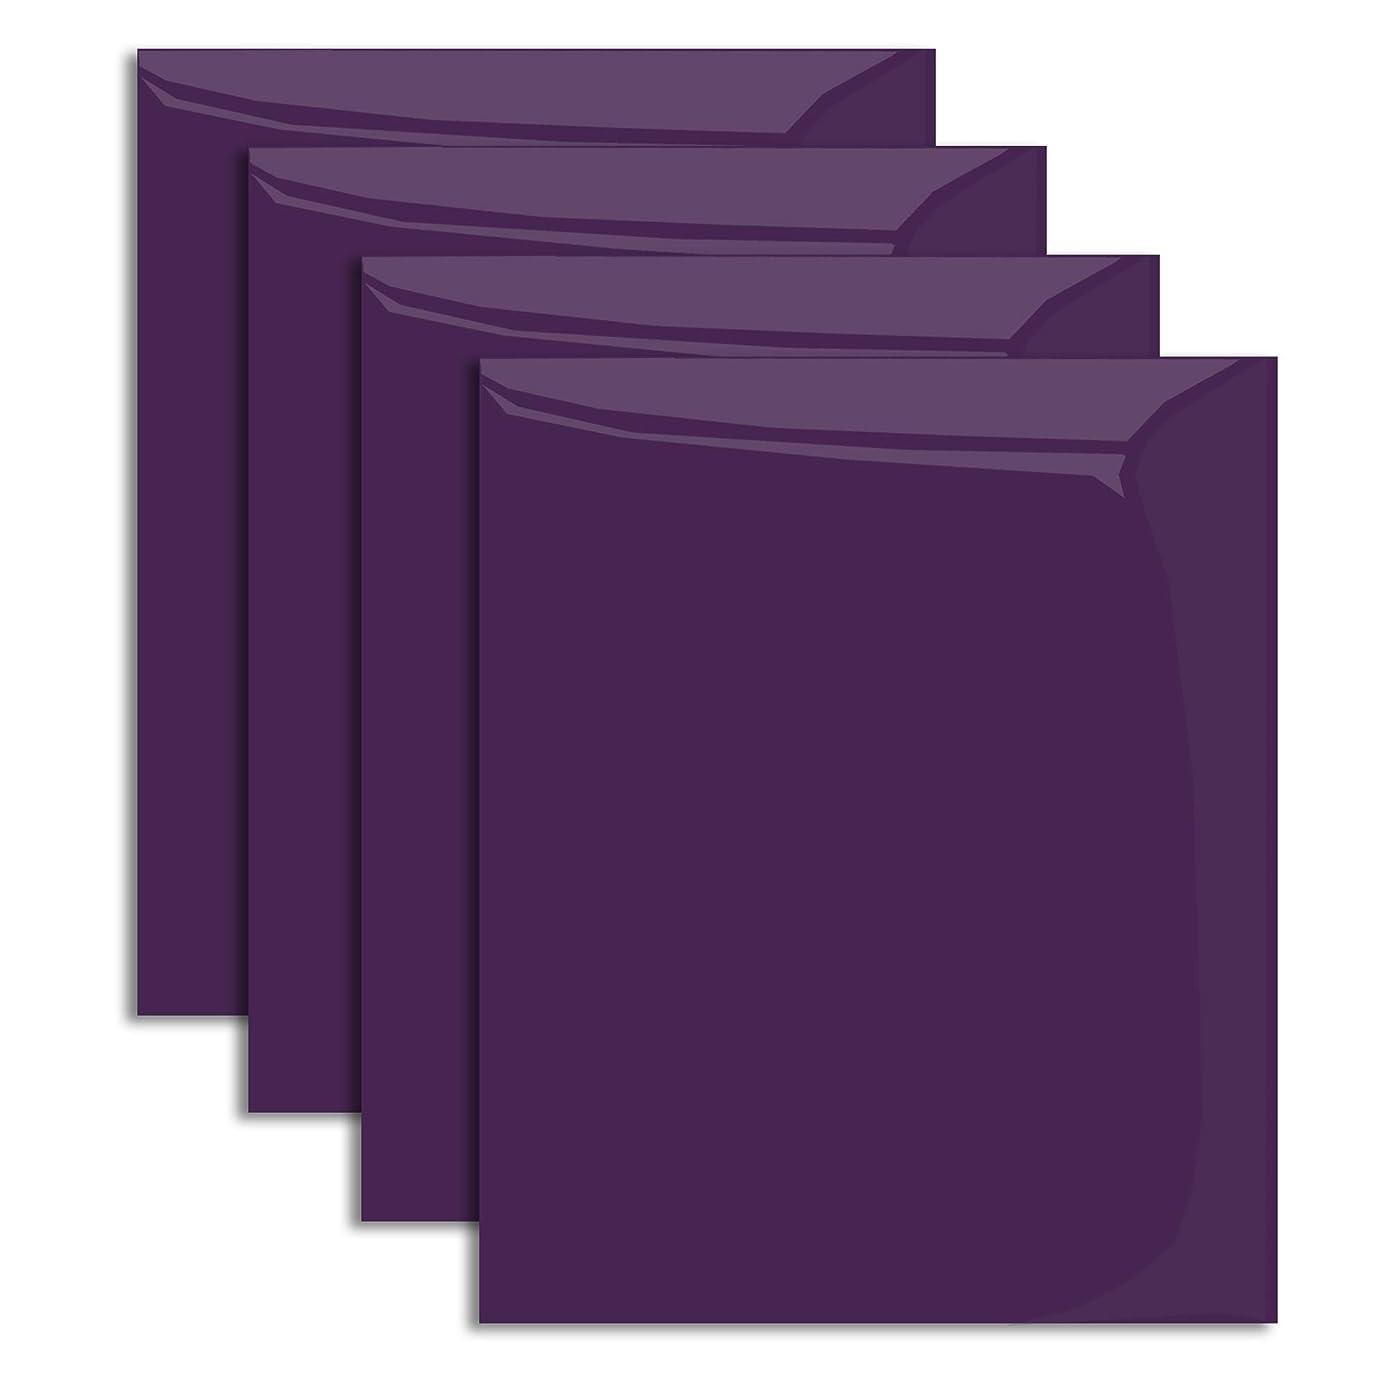 MiPremium PU Heat Transfer Vinyl, Purple Iron On Vinyl 12